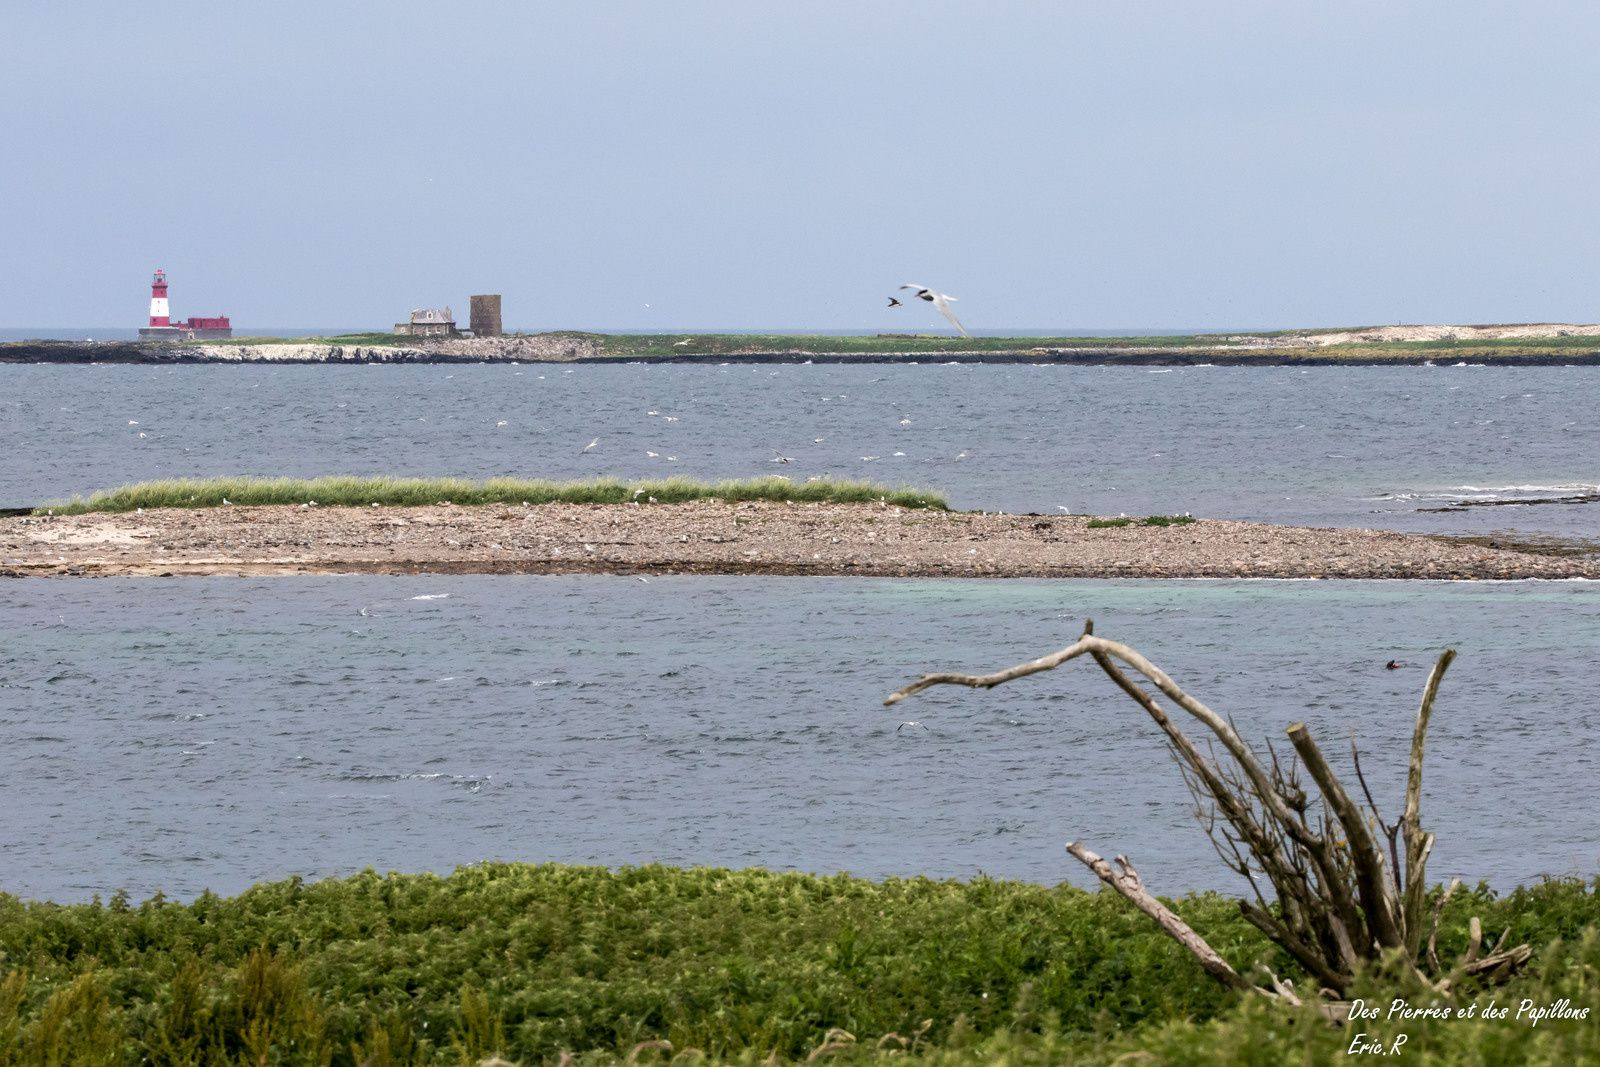 Vue en direction de l'île de Longstone depuis Inner Farne.